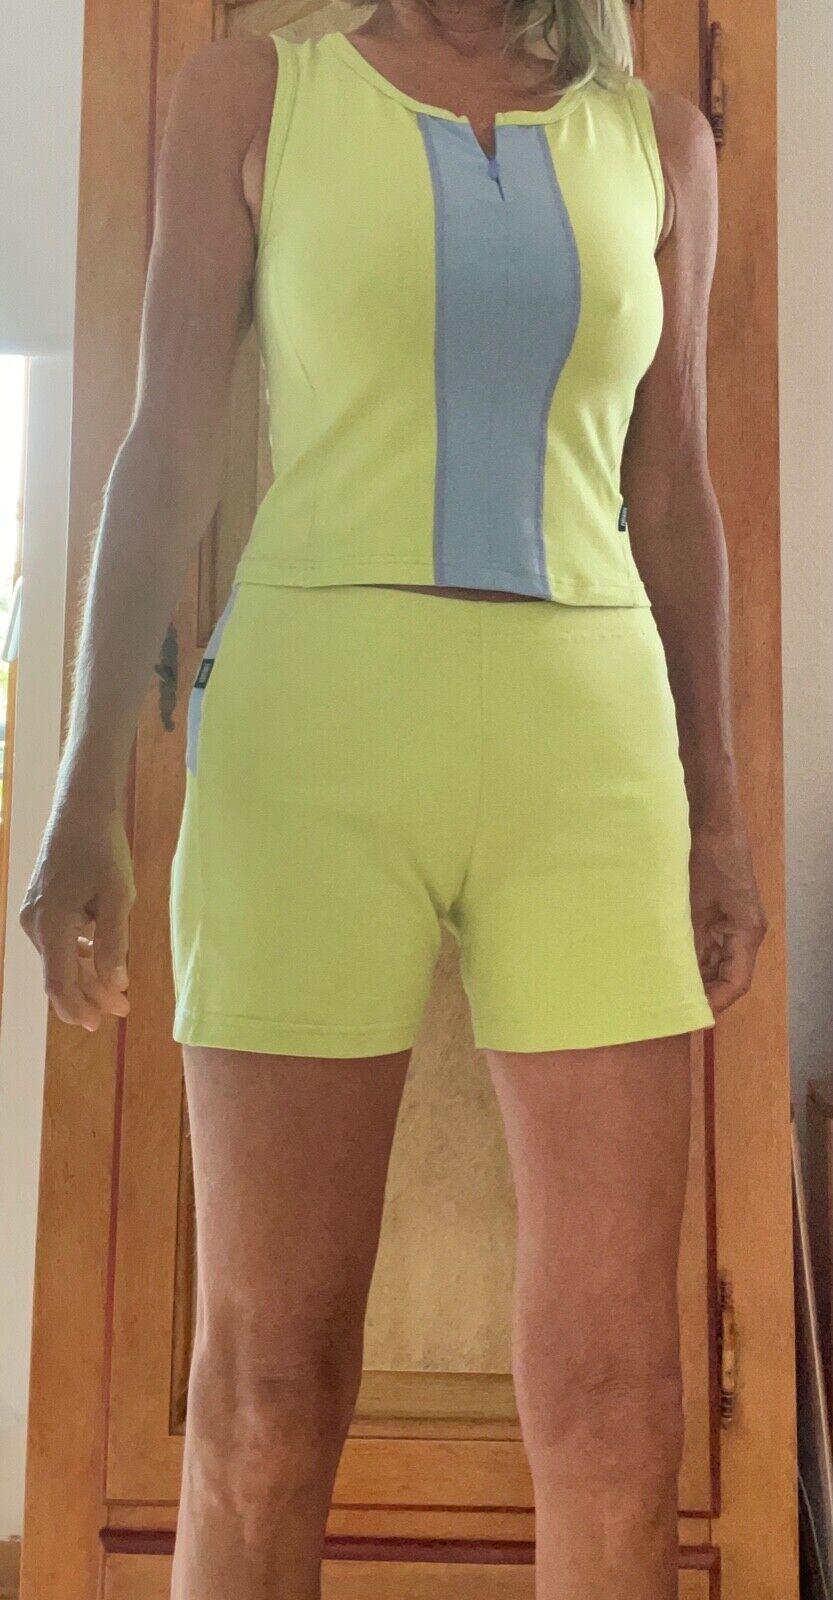 Bogner Fire & Ice Sport Pants Top Size S Light Green Fitness CMP Adidas Nike ODLO